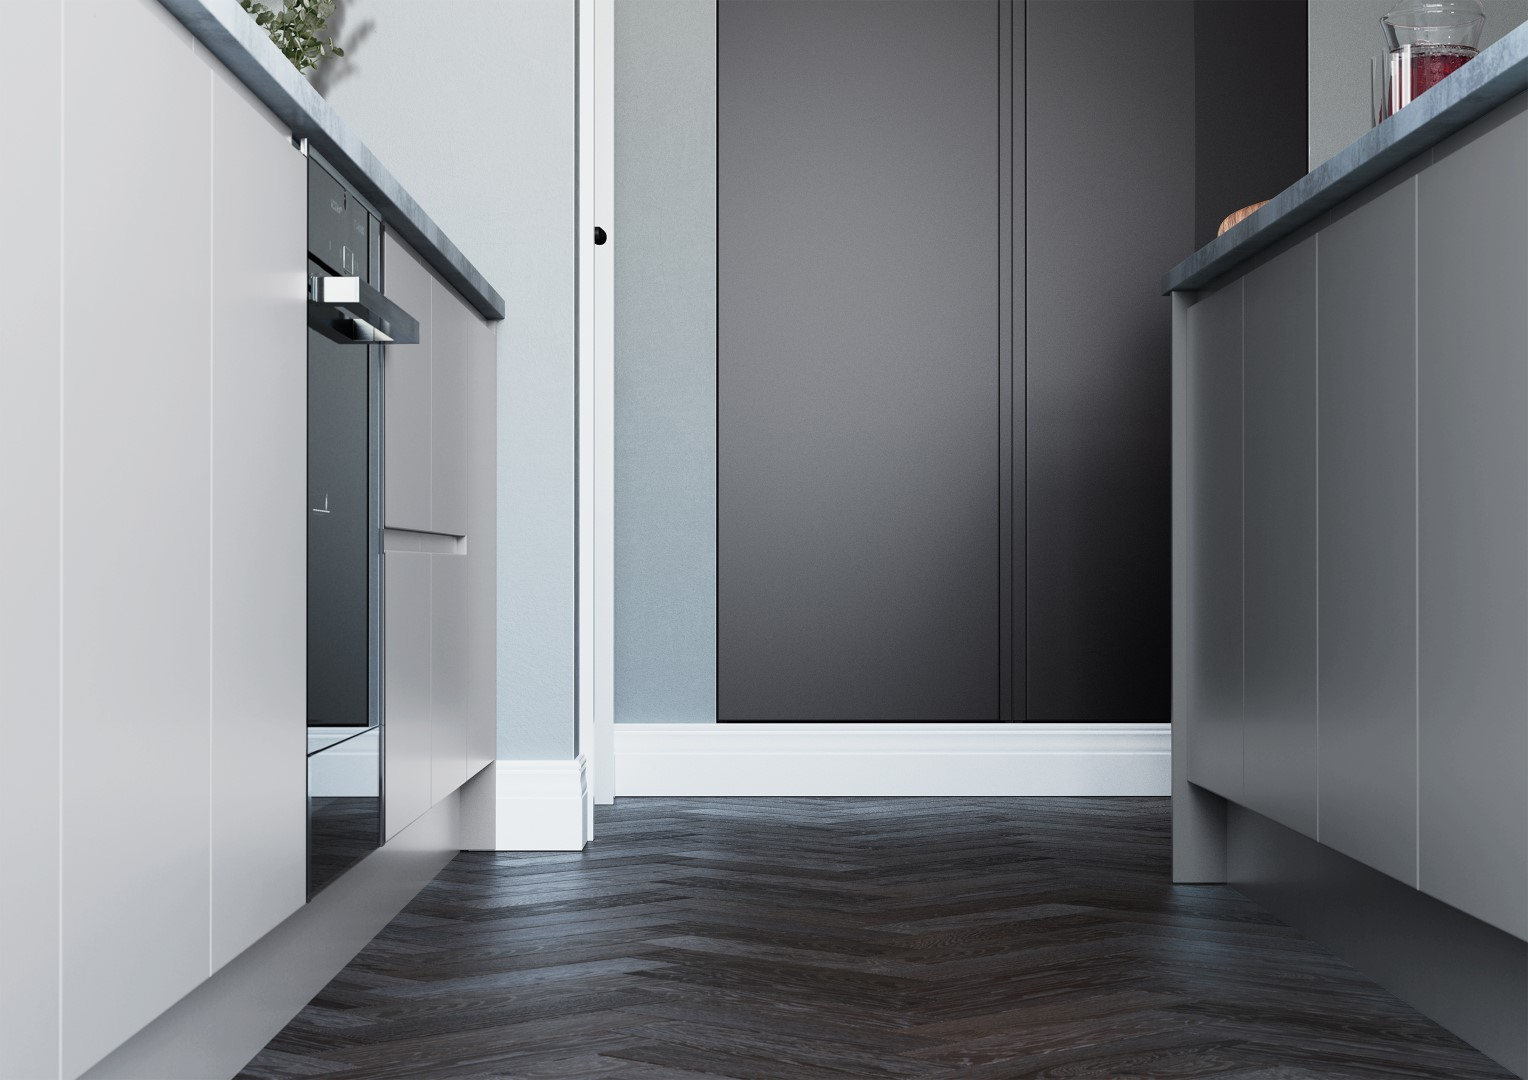 Strada Matte Light Grey and Dust Grey - Kitchen Design - Alan Kelly Kitchens - Waterford - 3